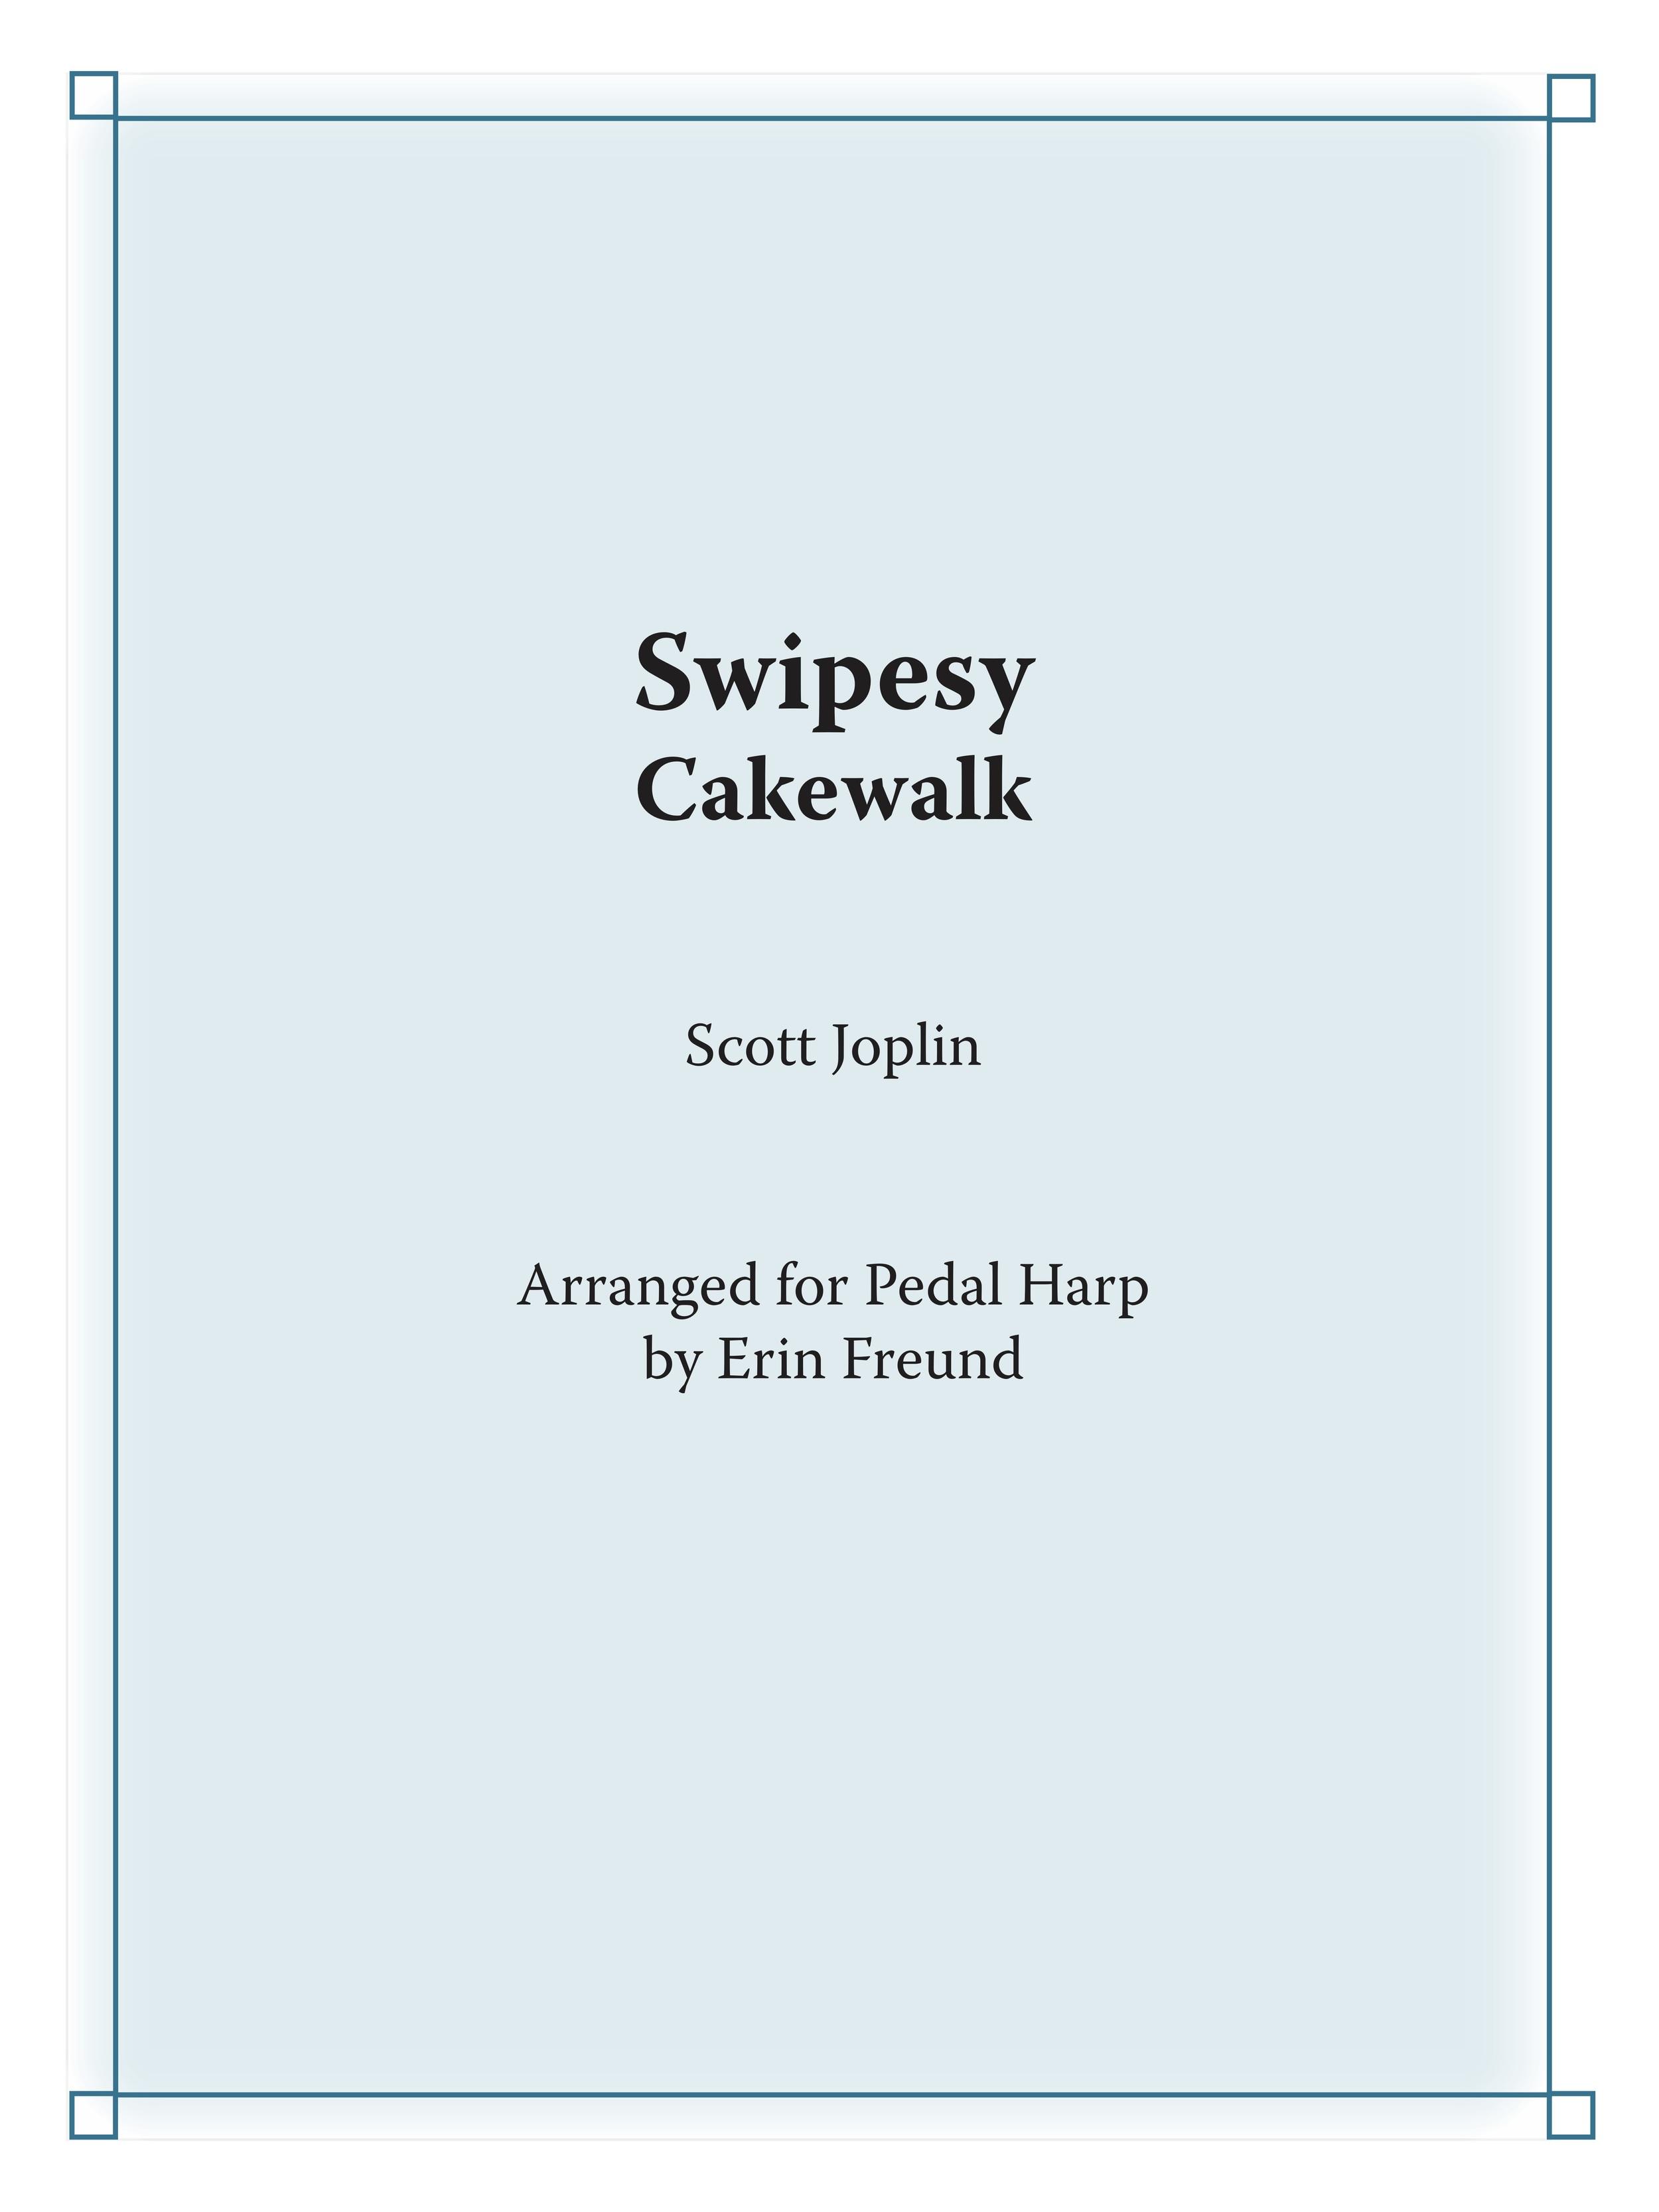 Swipesy cover.jpg